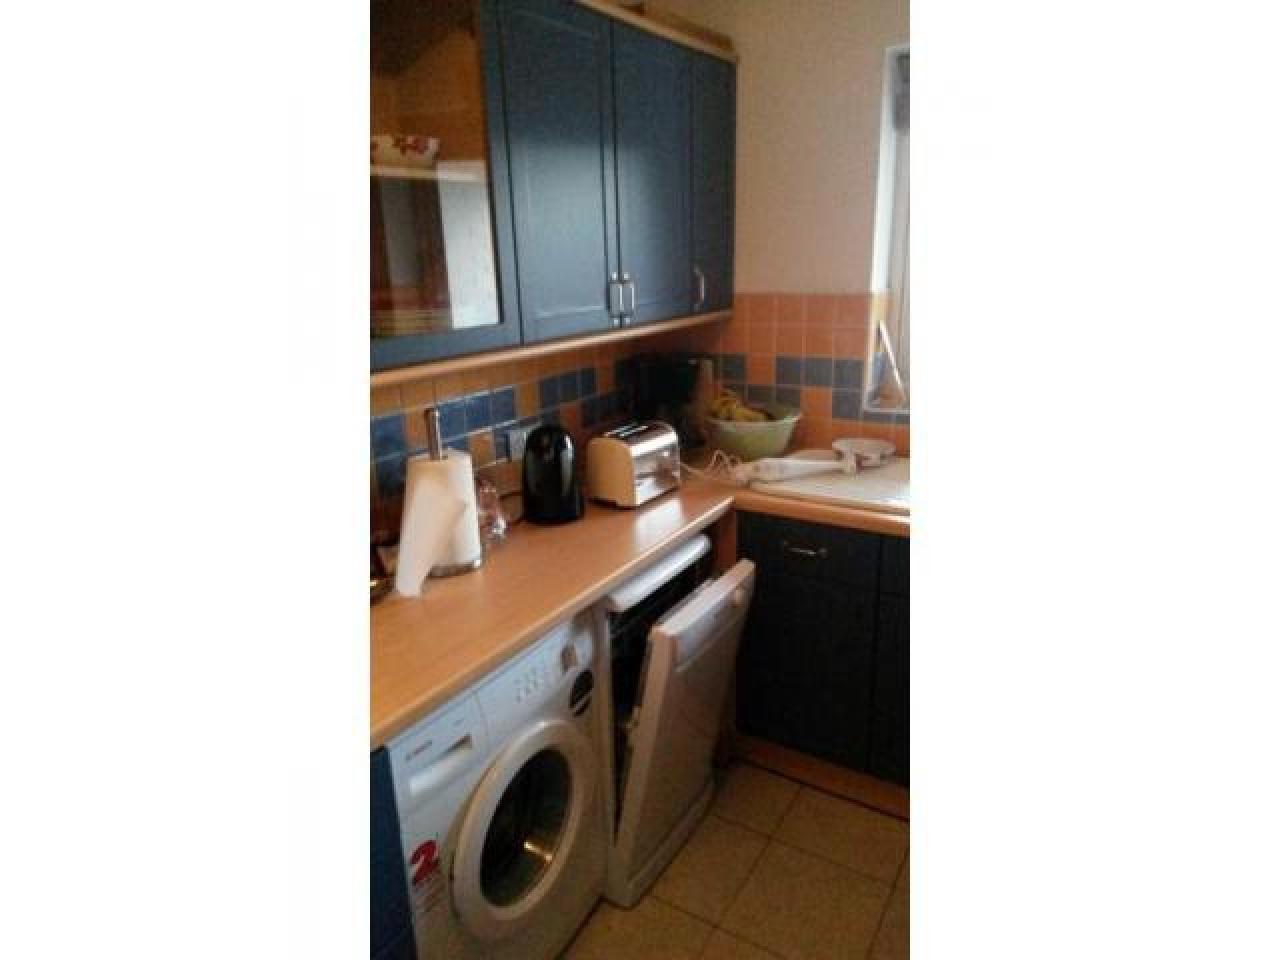 Сдаём 2-комнатную квартиру (one bedroom), Sougate, N14 (Лондон) - 2